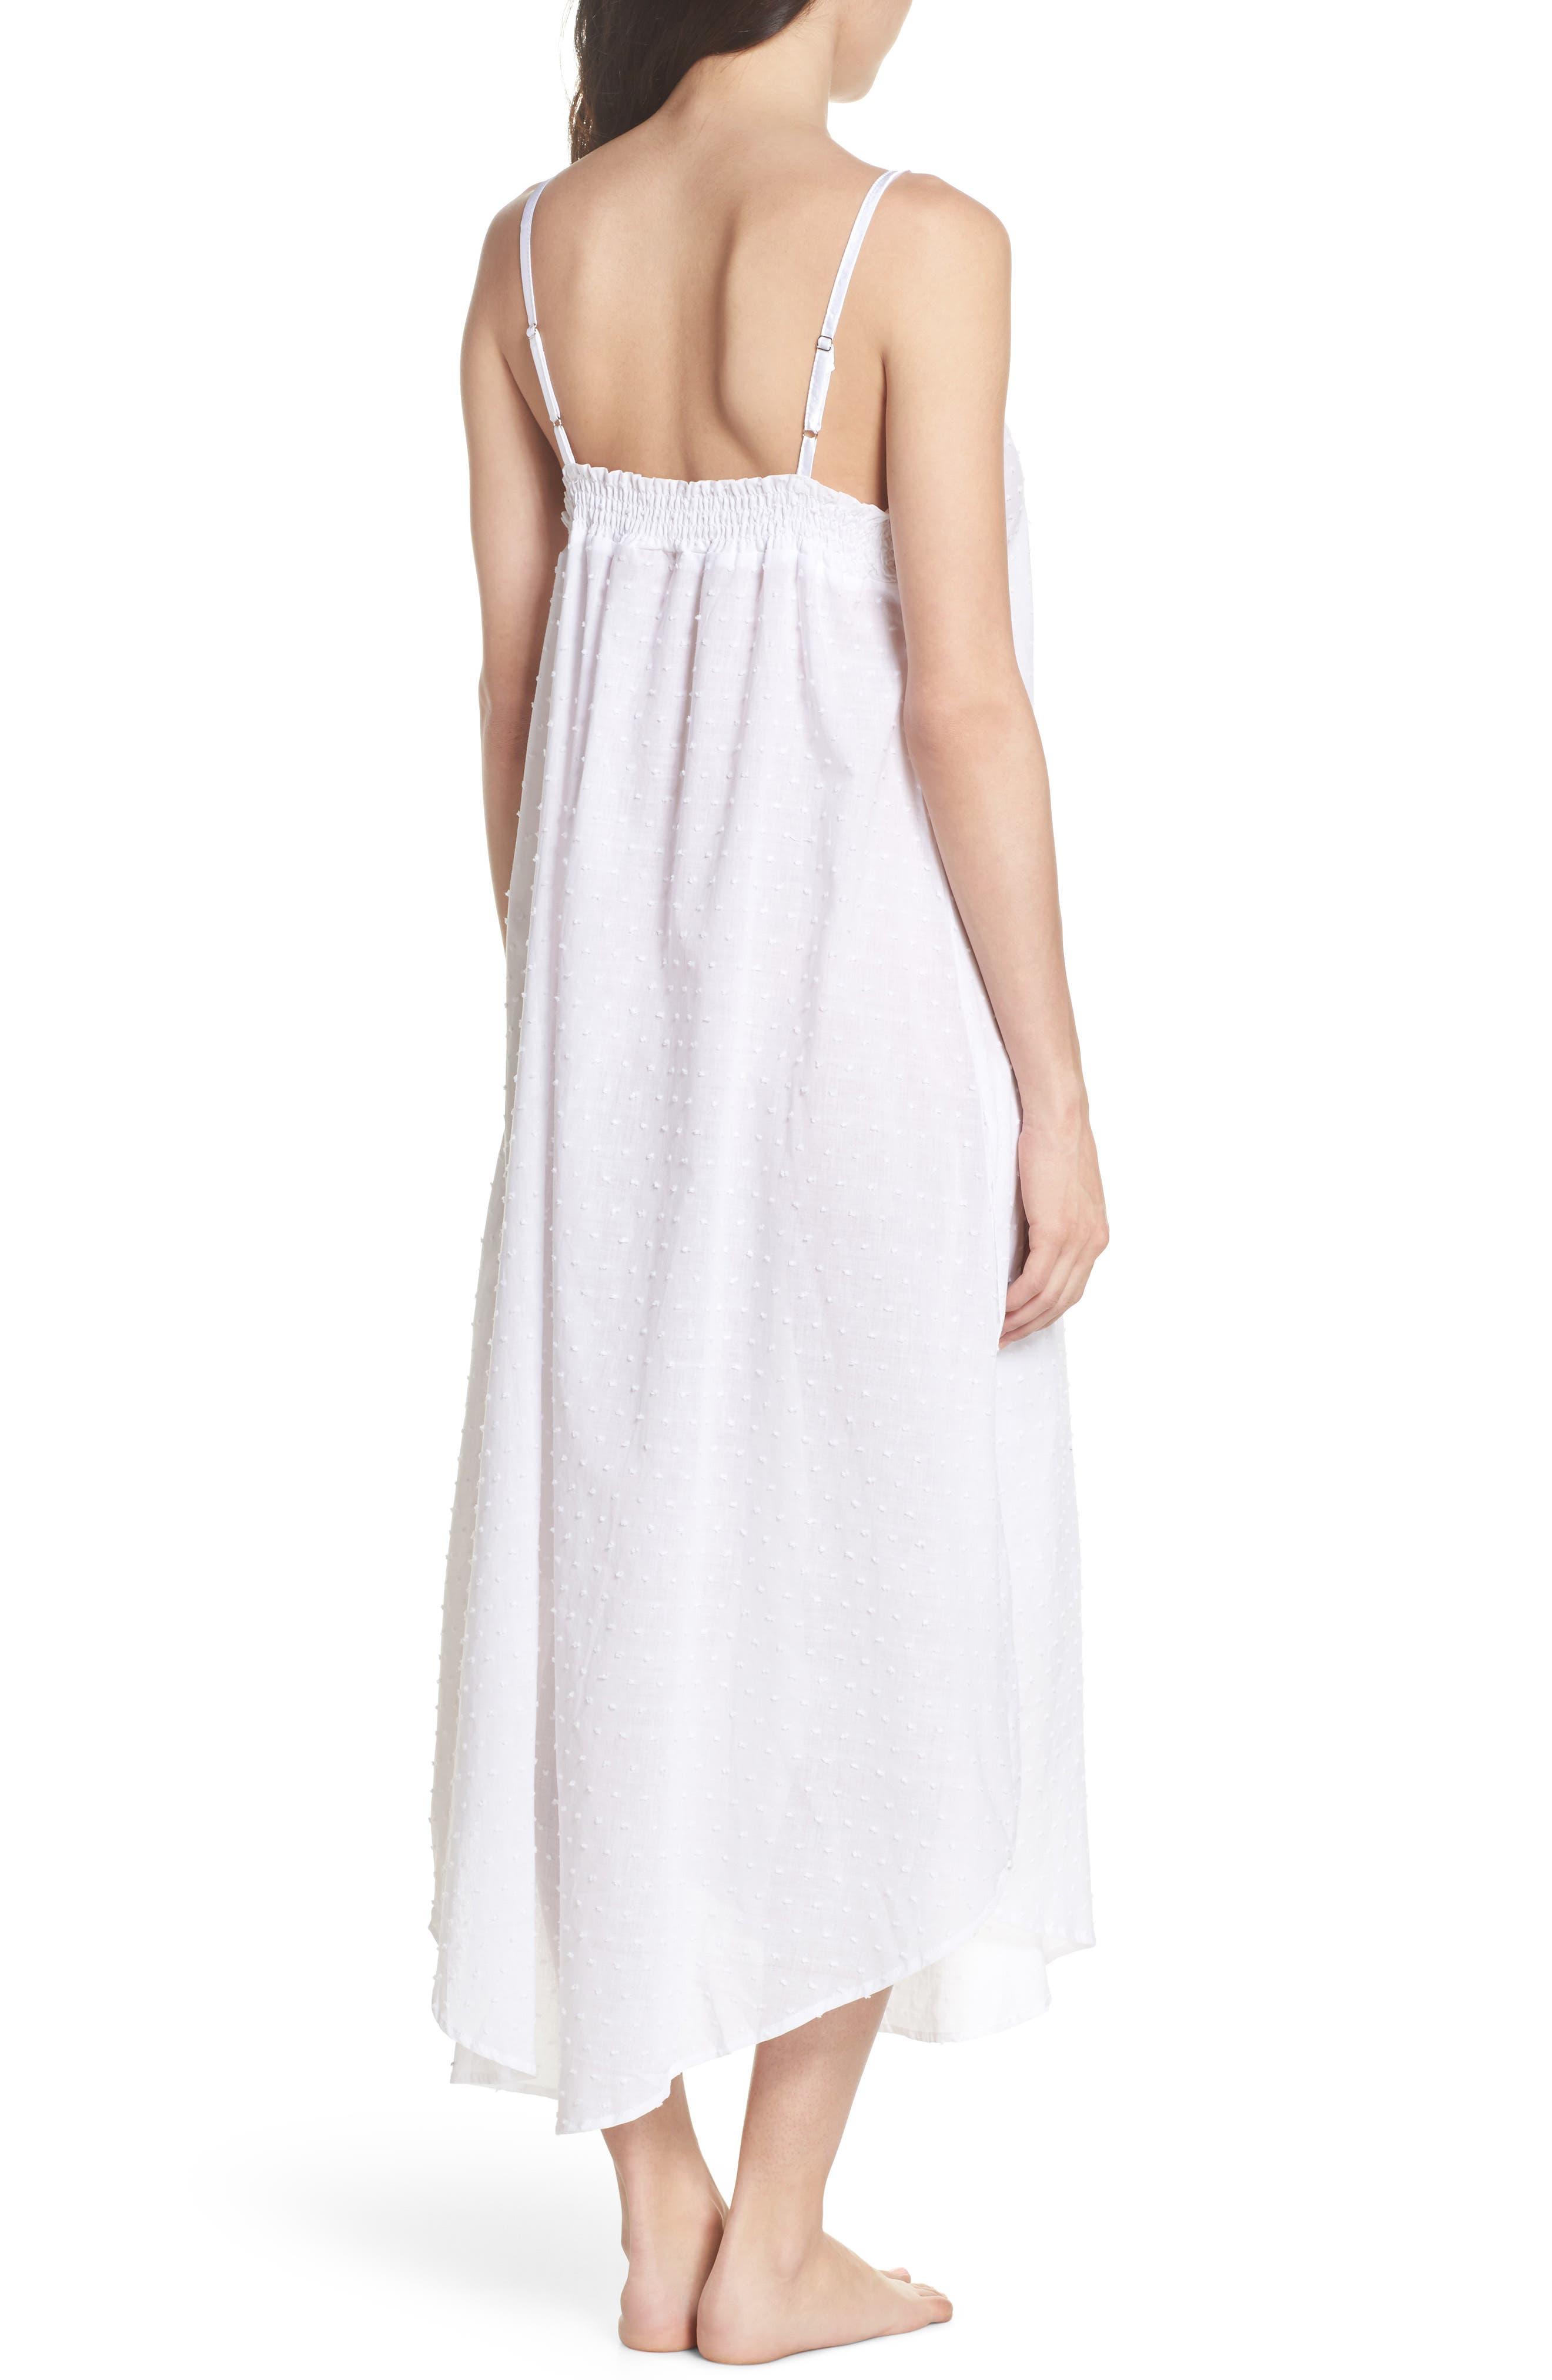 Swiss Dot Nightgown,                             Alternate thumbnail 2, color,                             White